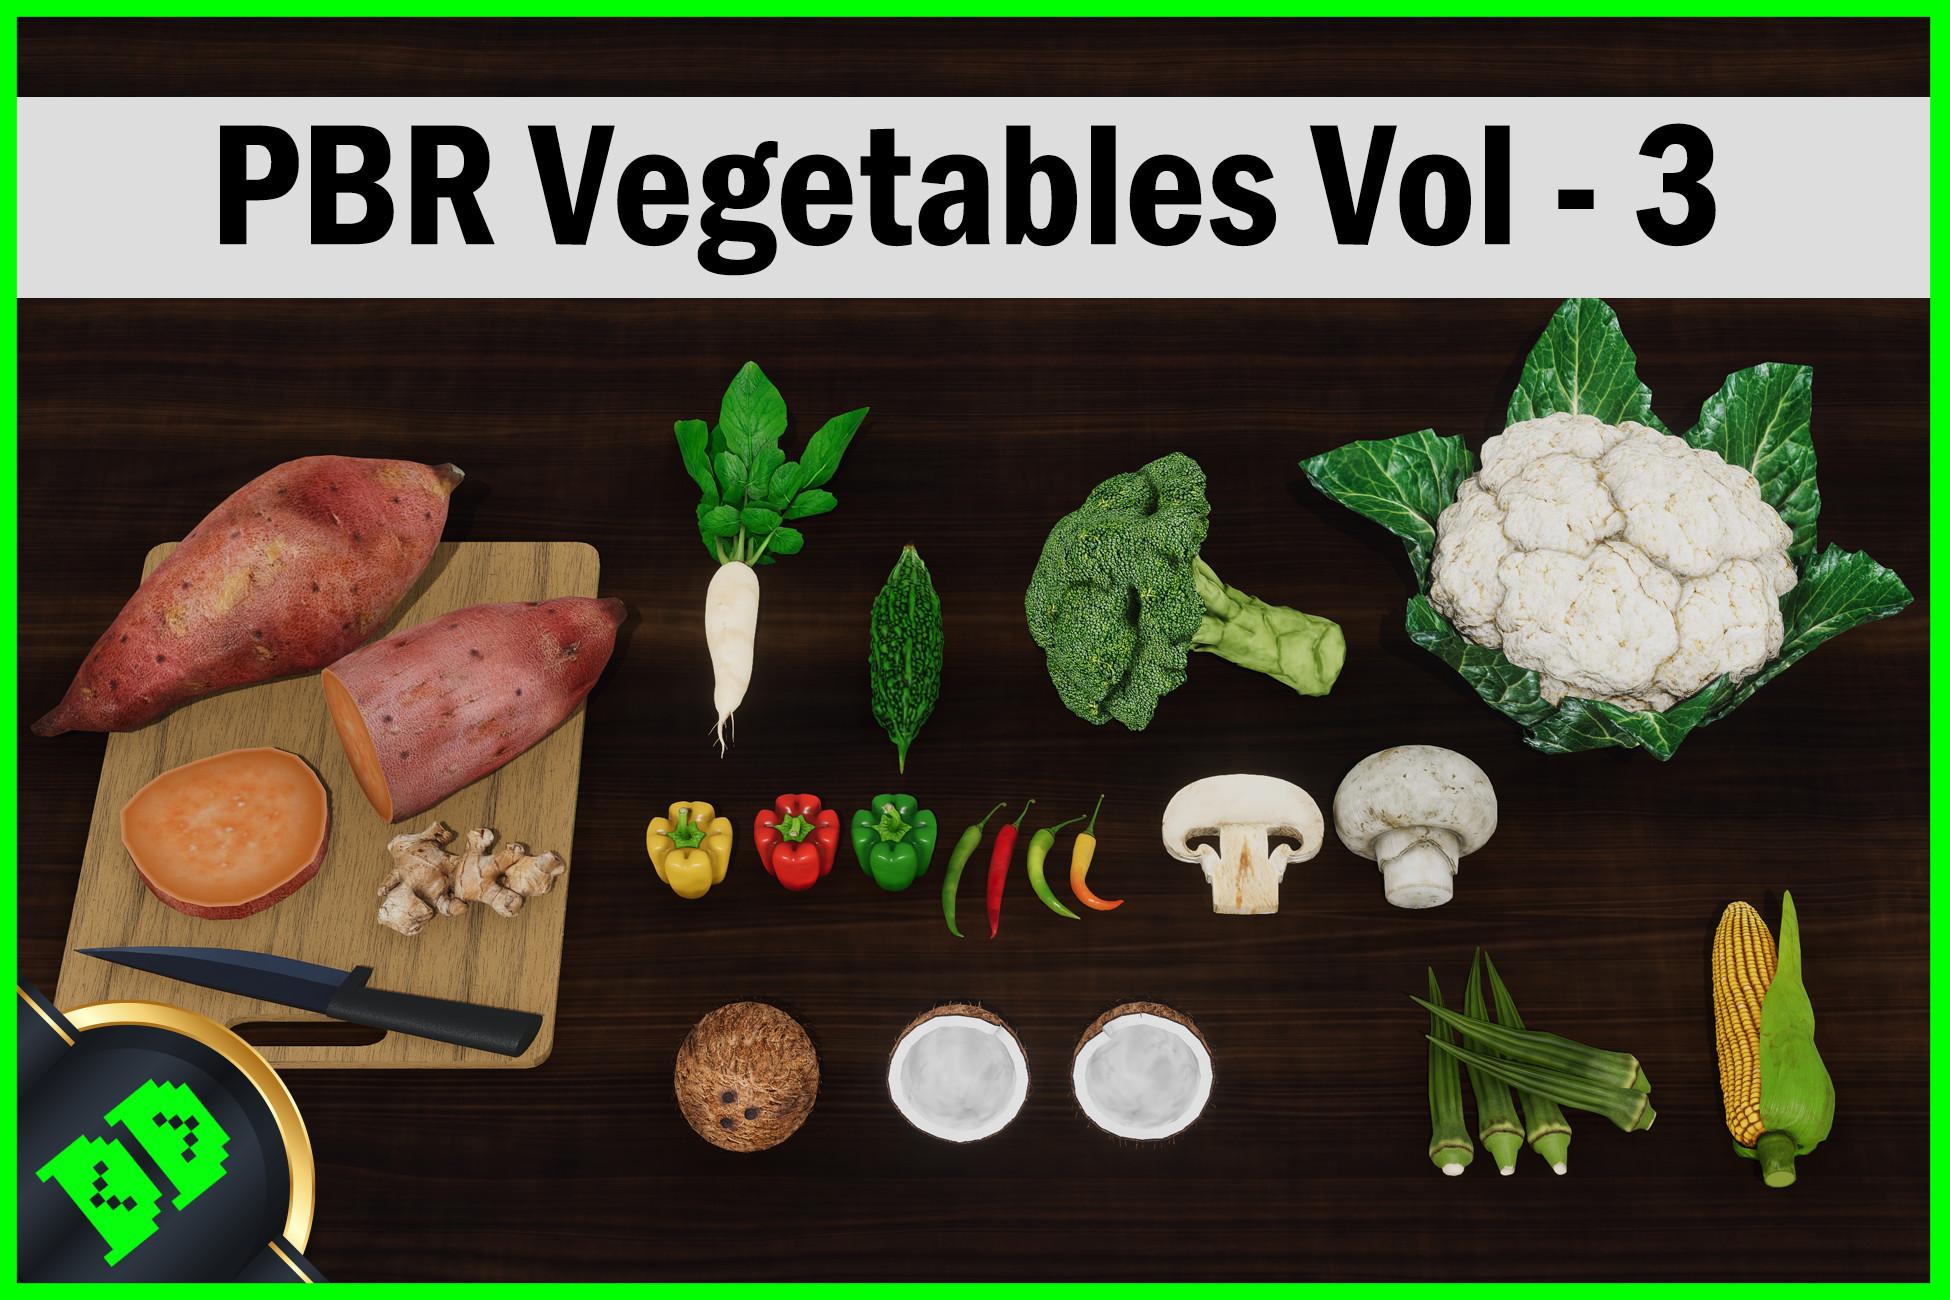 PBR Vegetables Vol - 3